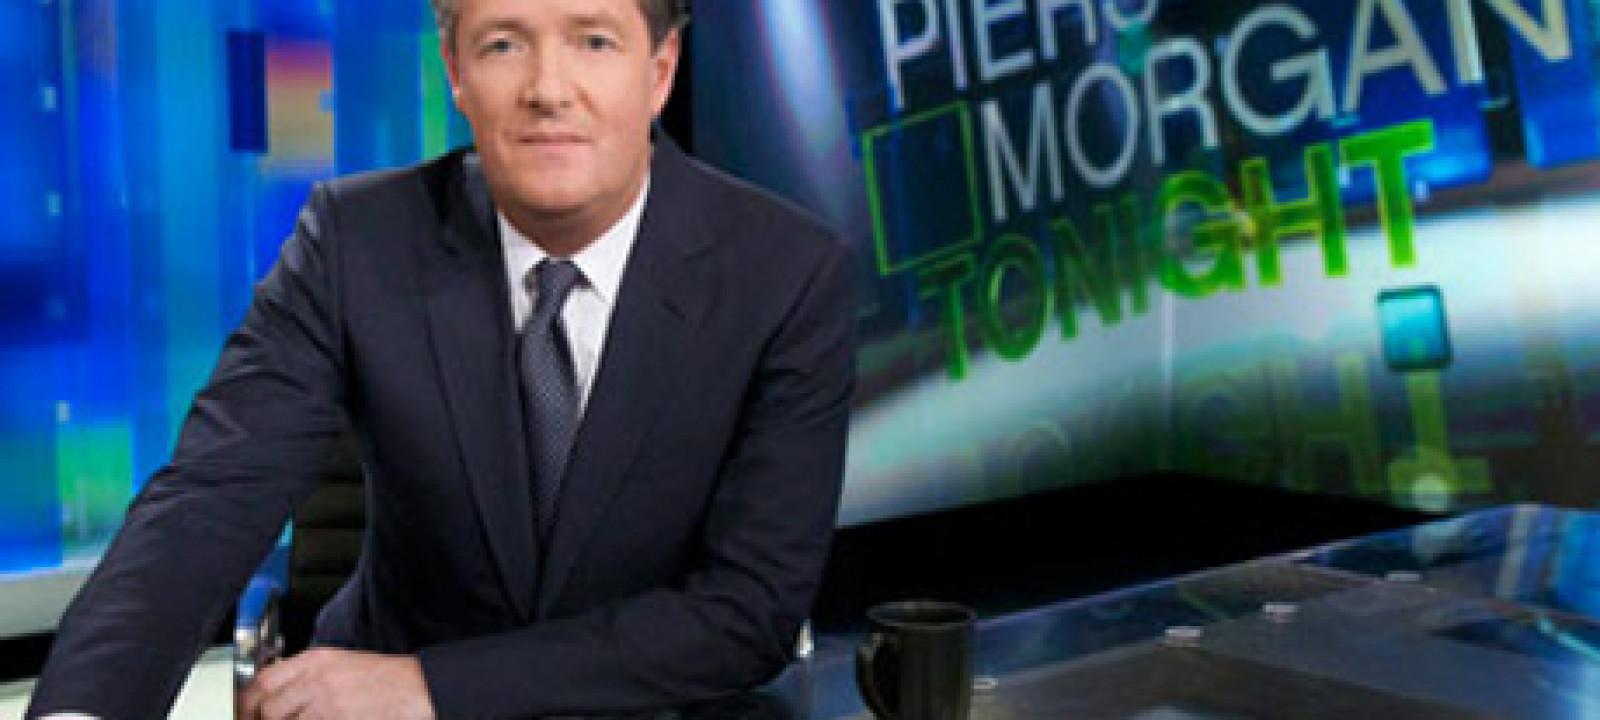 Piers Morgan, ON TV